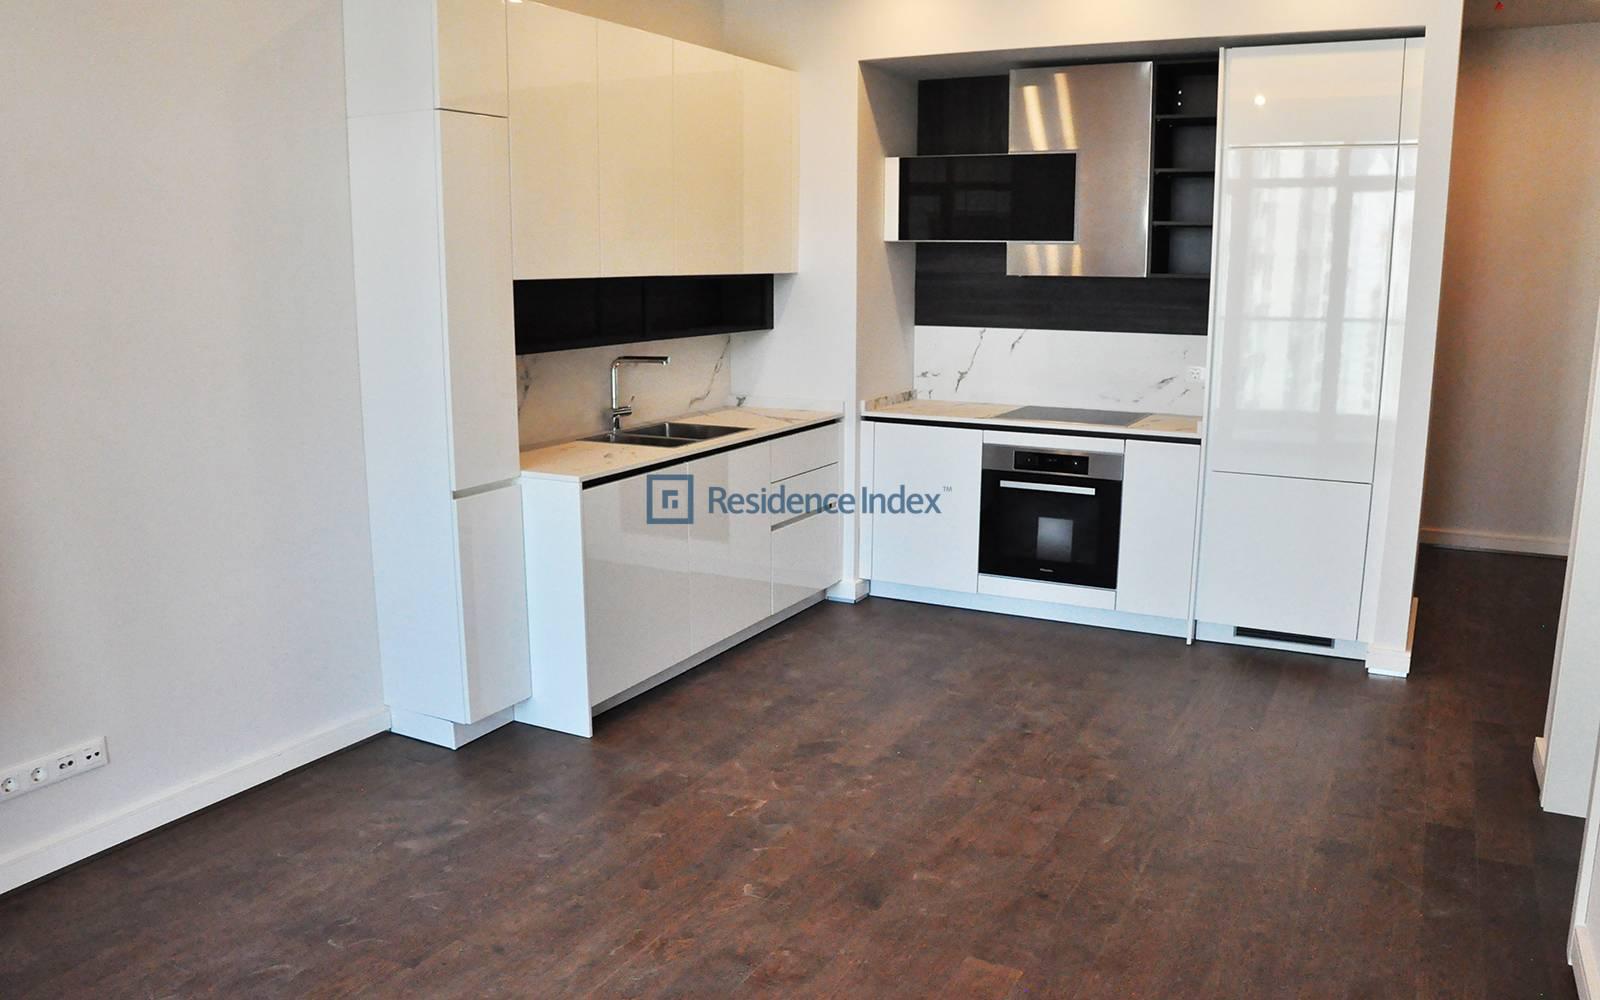 Piyalepaşa İstanbul - 1 + 1 apartment for sale